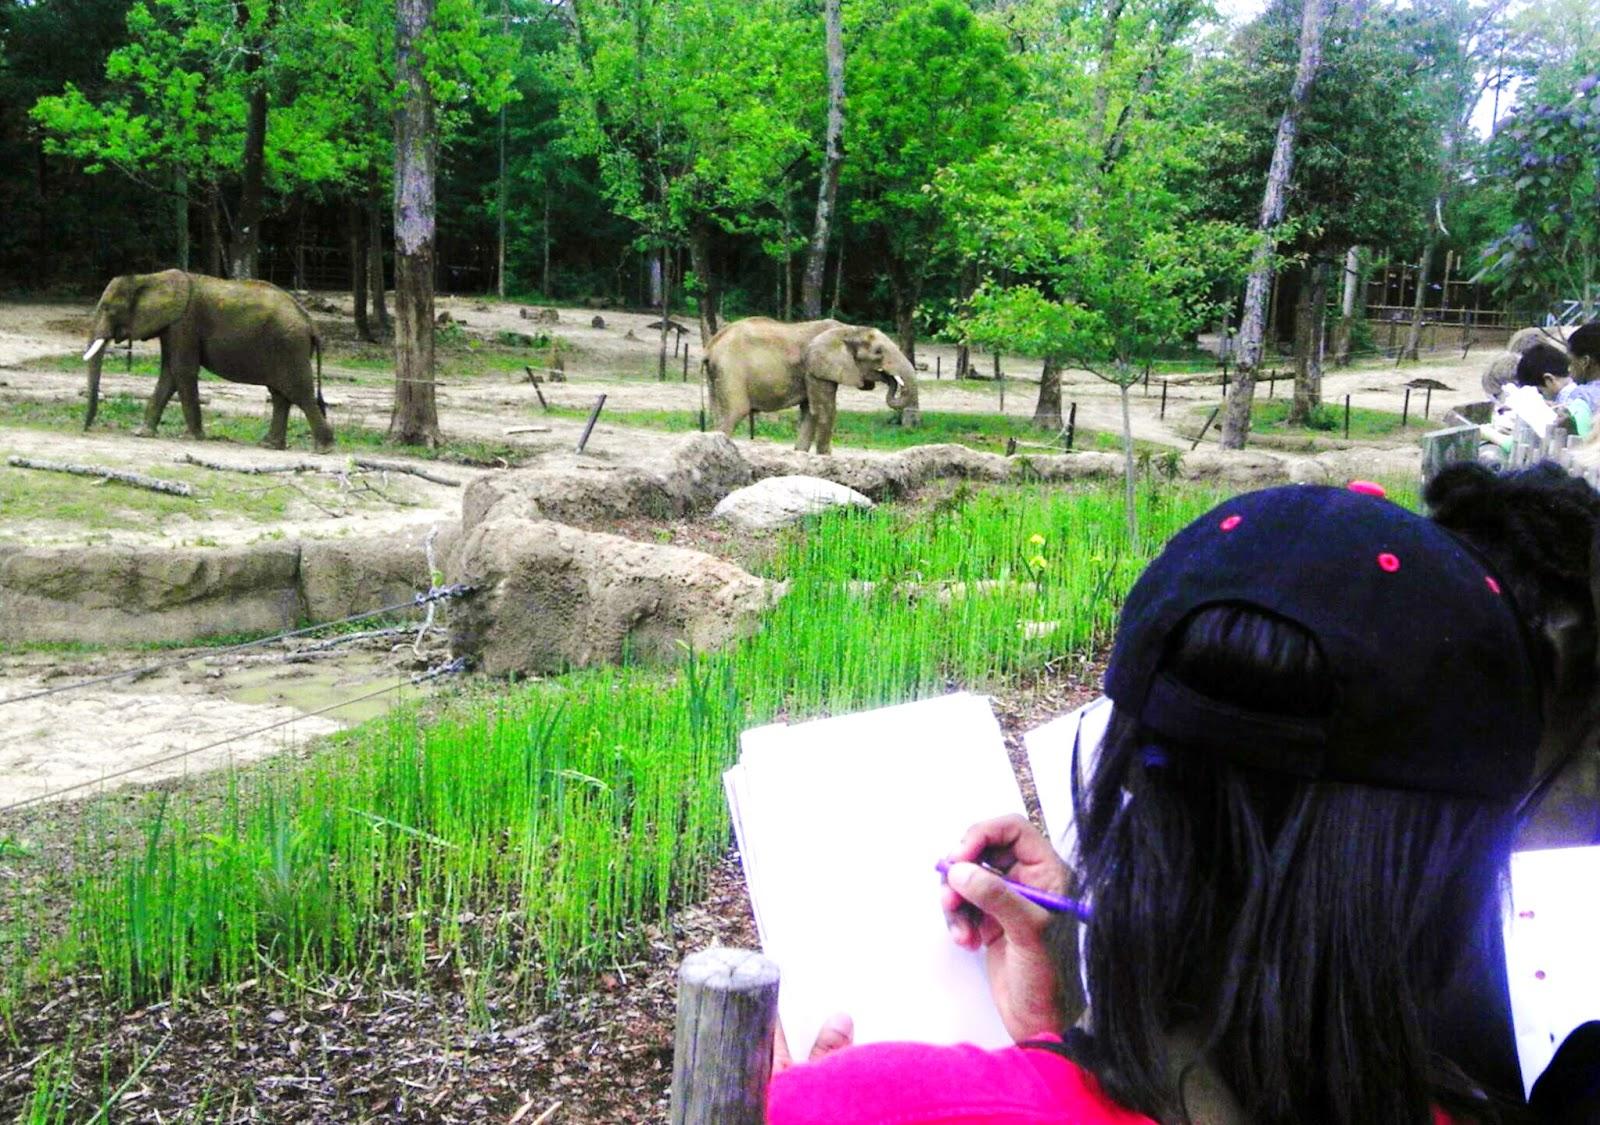 hospitality and tourism essay writing ielts